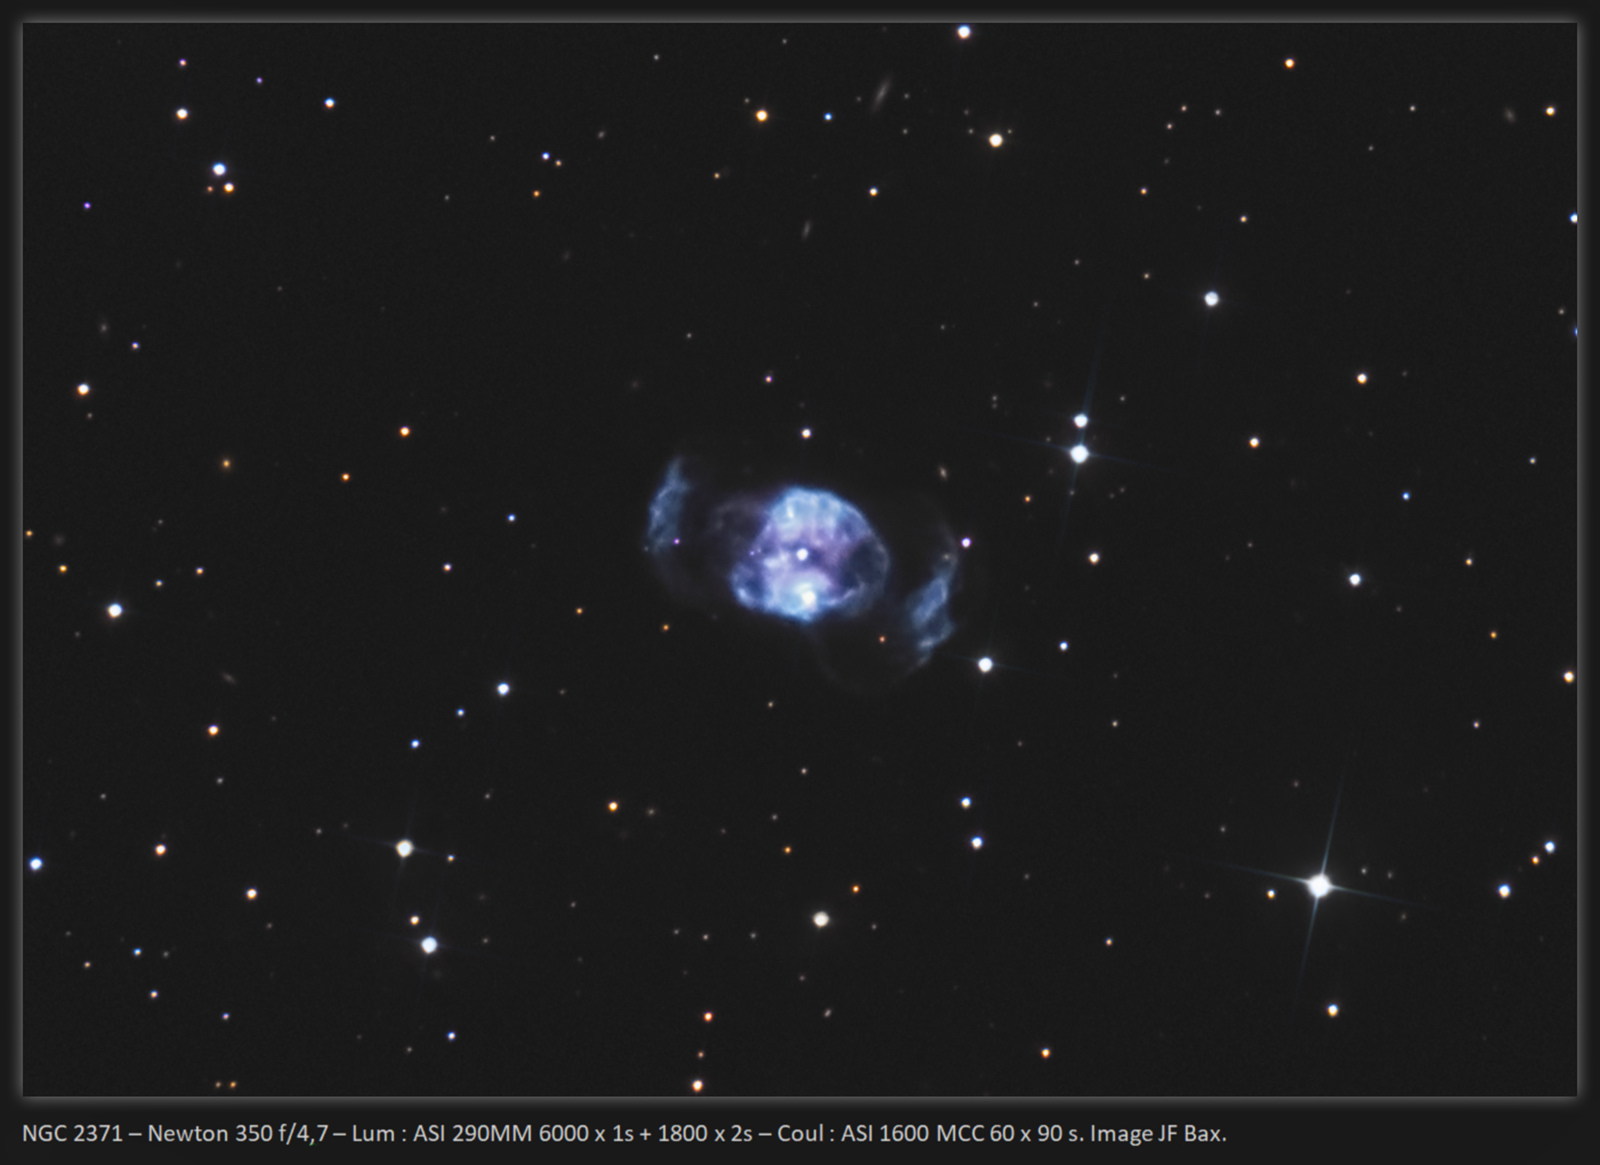 NGC-2371-final6-cadre_web.jpg.bfa2cf6c6e798a271dc283bf4b8622a9.jpg